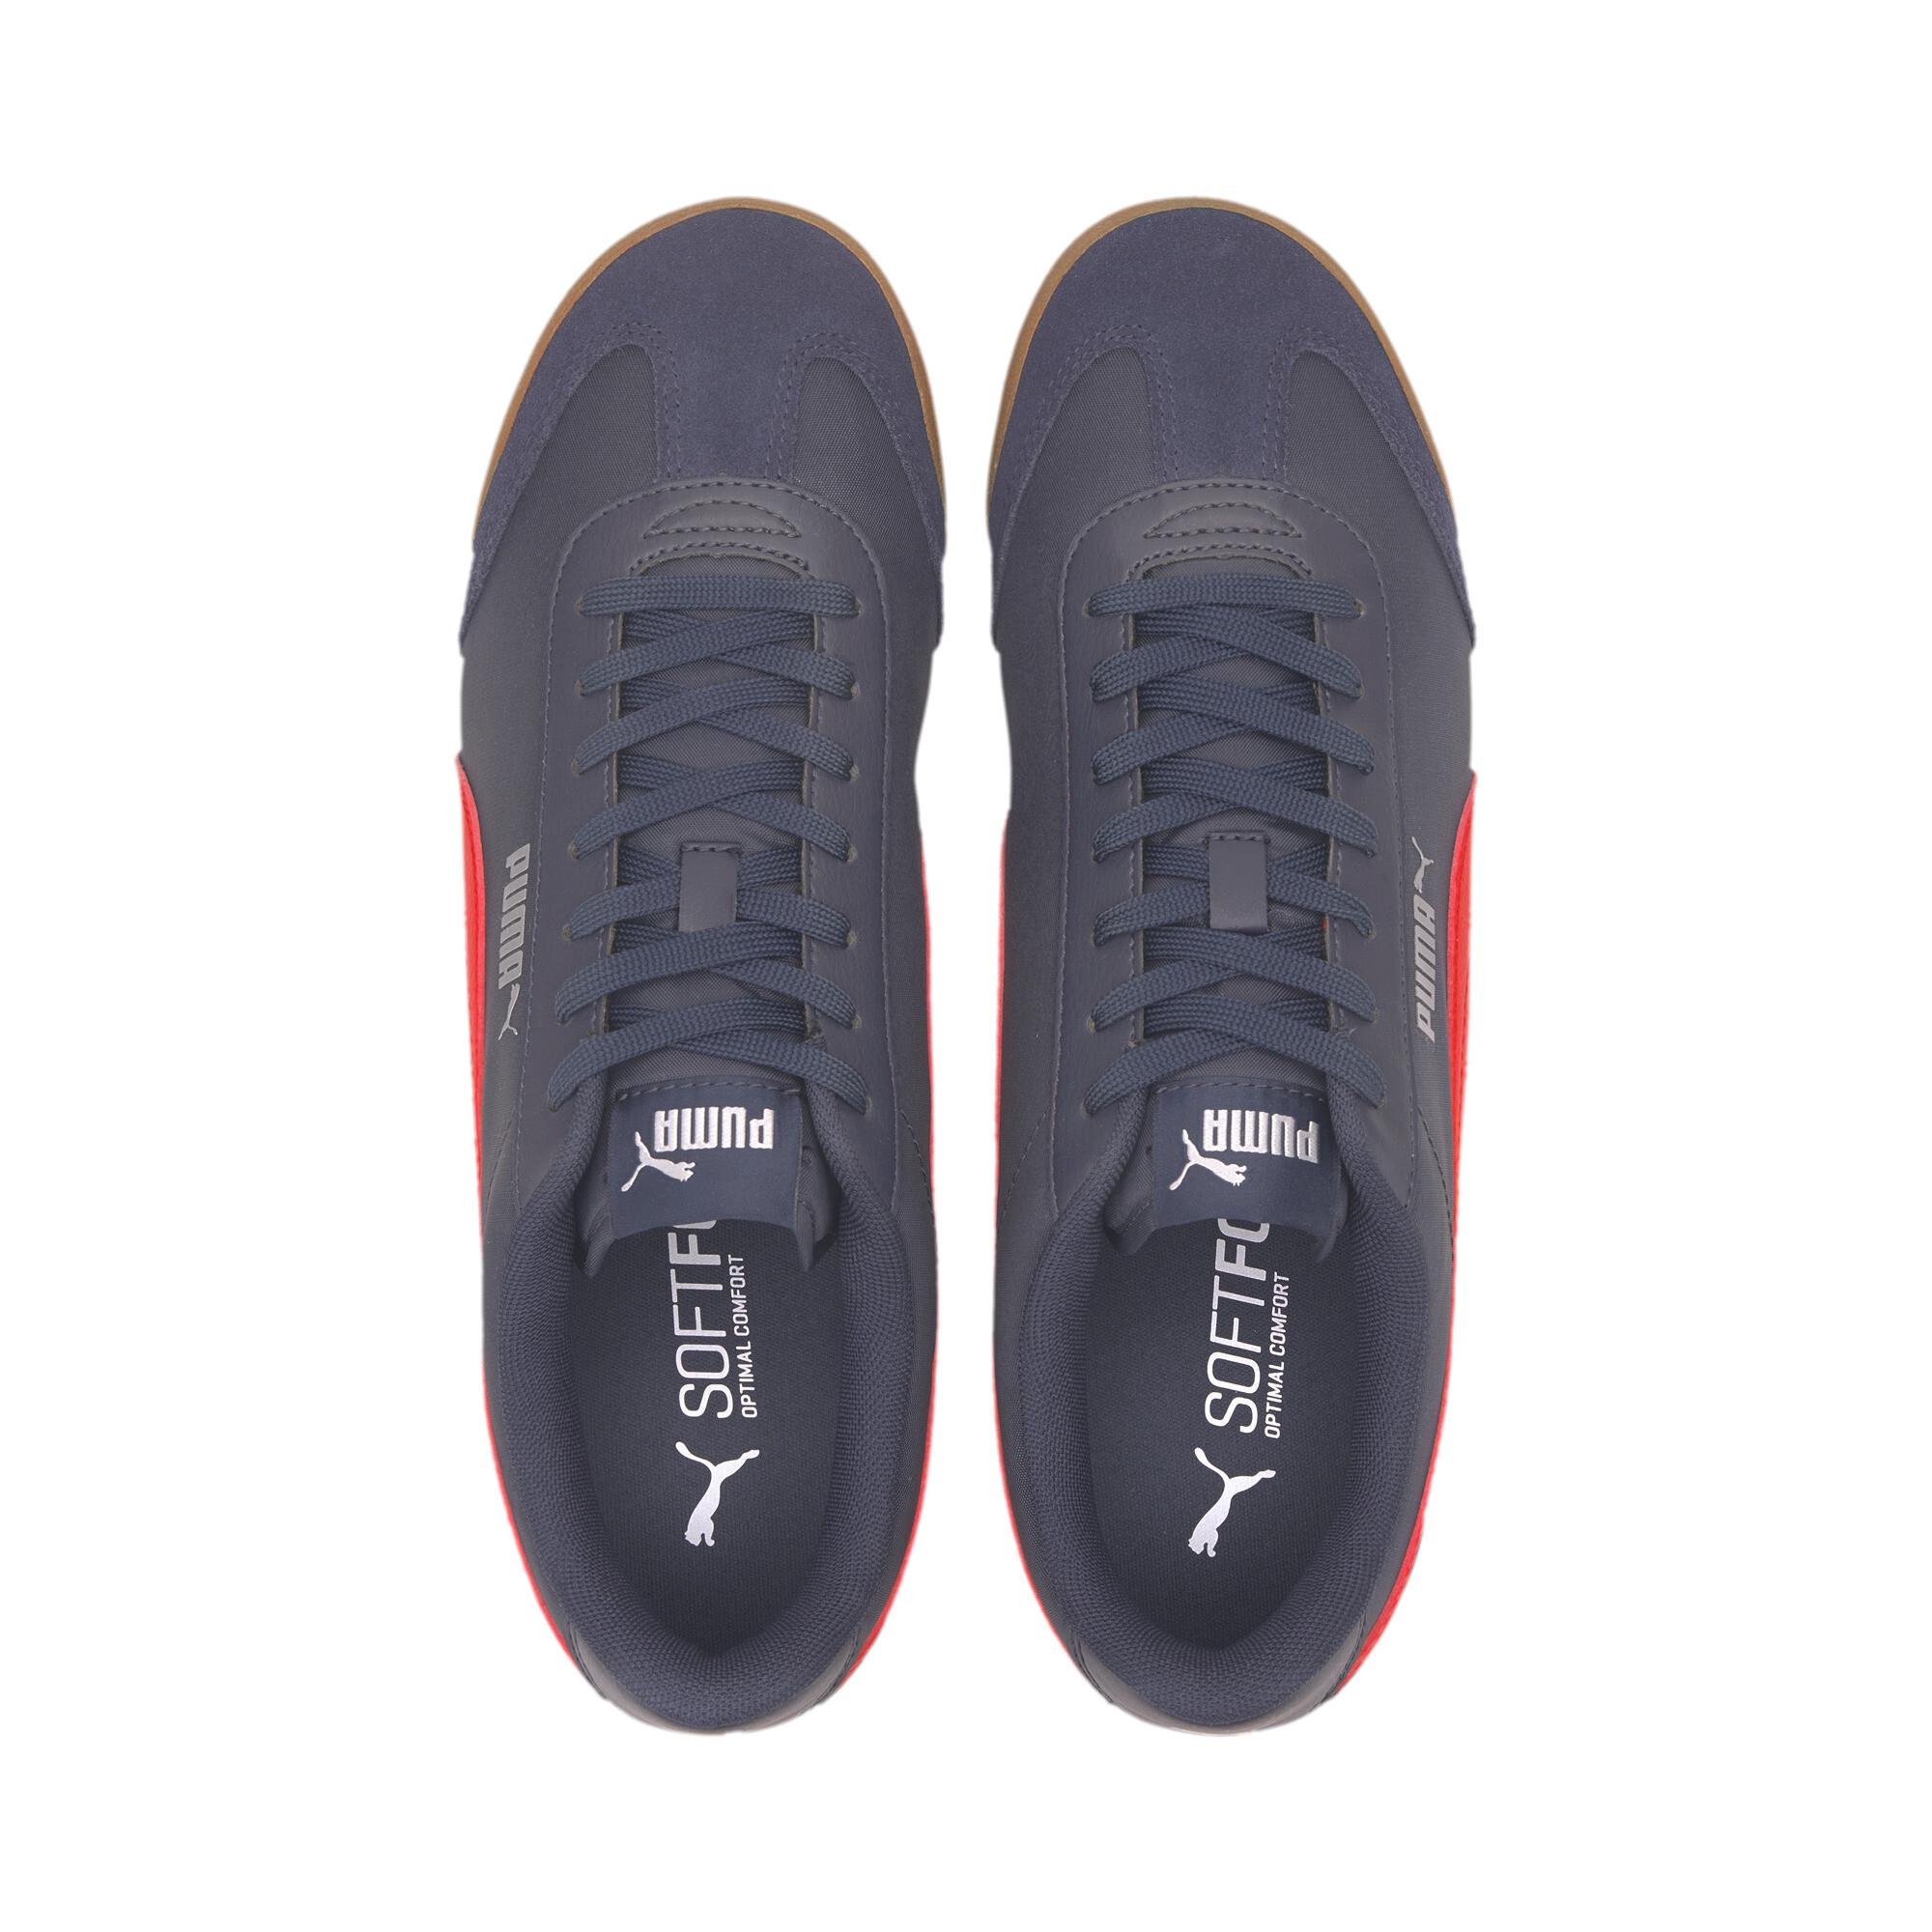 PUMA-Men-039-s-Turino-NL-Sneakers thumbnail 15